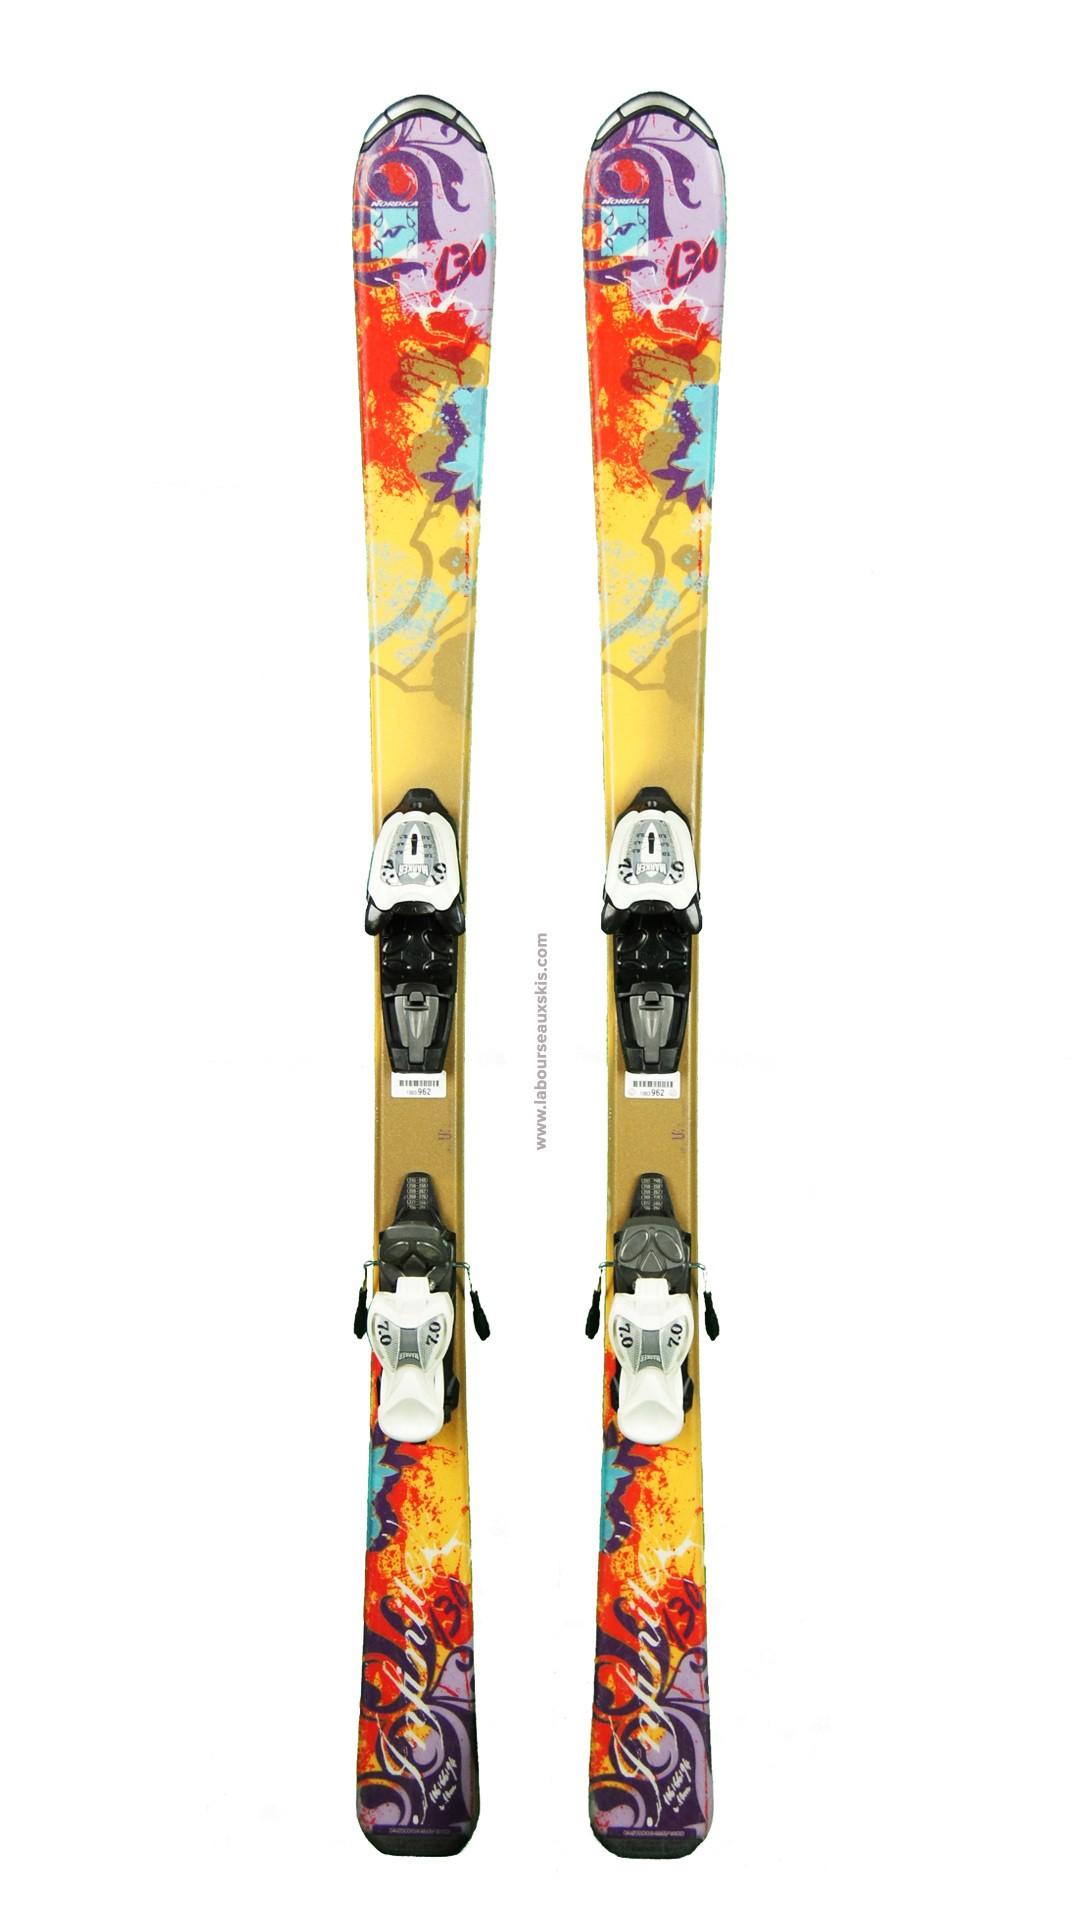 ski occasion nordica infinite skis d 39 occasion. Black Bedroom Furniture Sets. Home Design Ideas